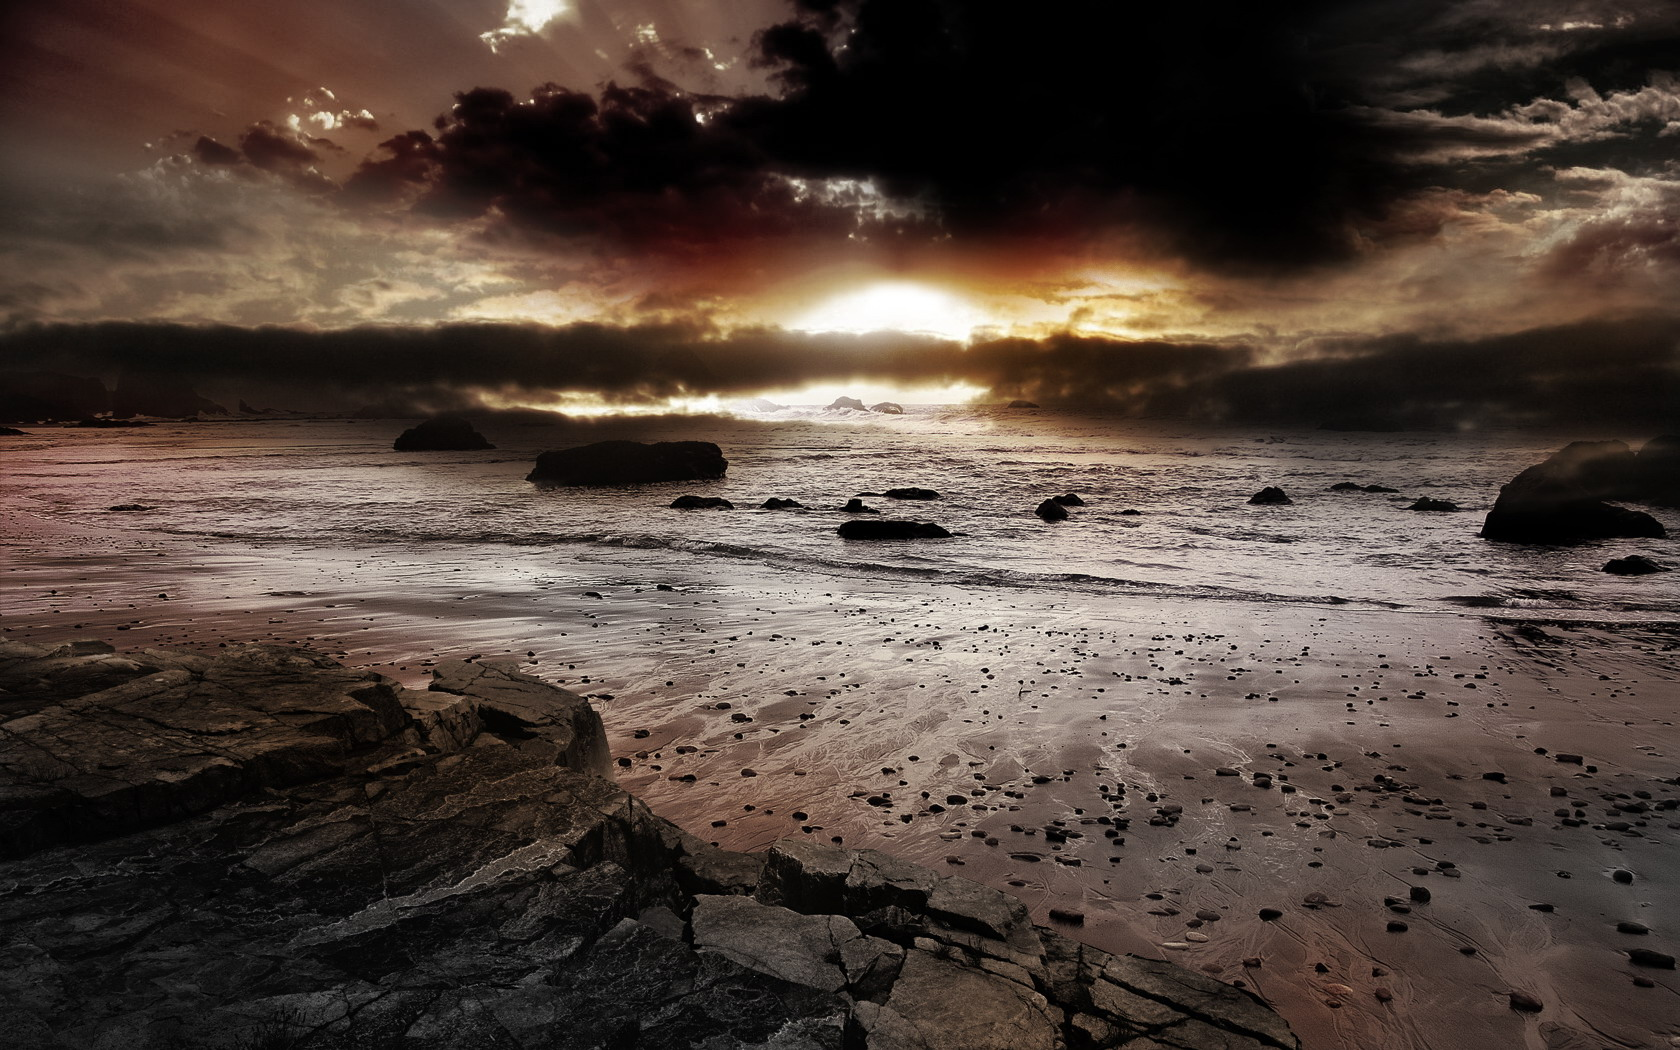 Dark sunset 1 1 ljcoe6 fm0 1680x1050